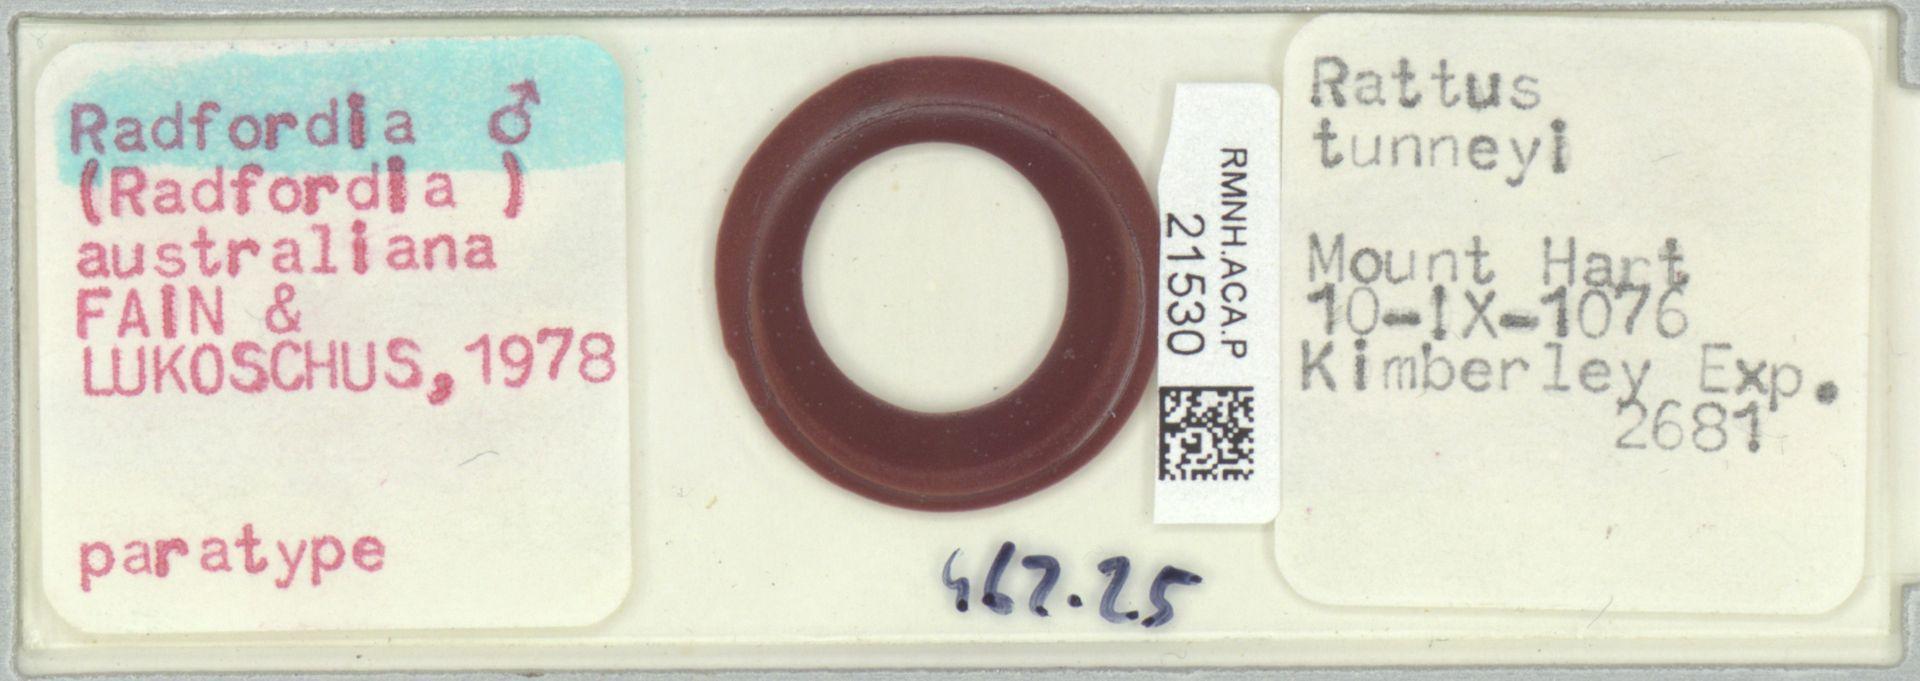 RMNH.ACA.P.21530   Radfordia (Radfordia) australiana Fain & Lukoschus, 1978